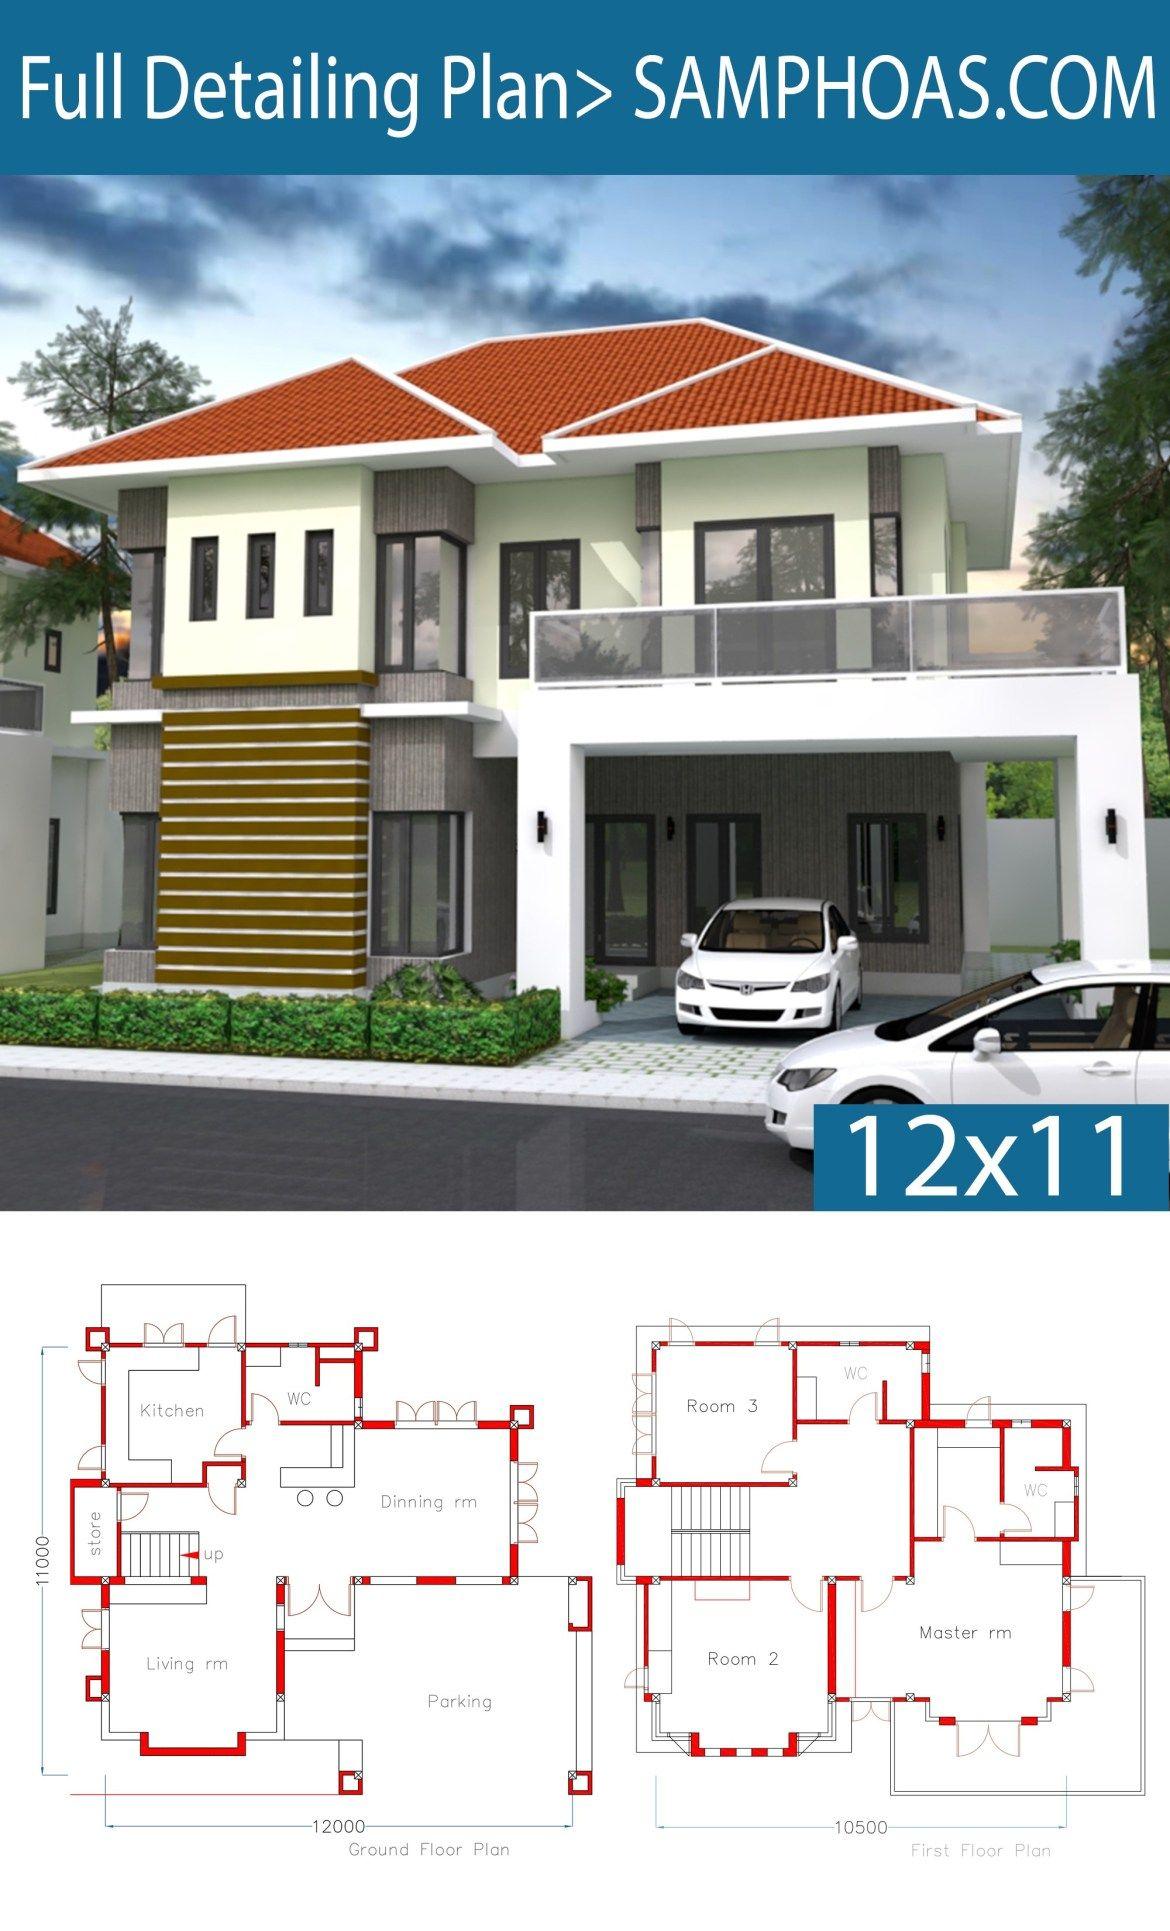 3 Bedrooms Home Plan 12x11m Samphoas Plansearch House Plans House Layout Plans House Design